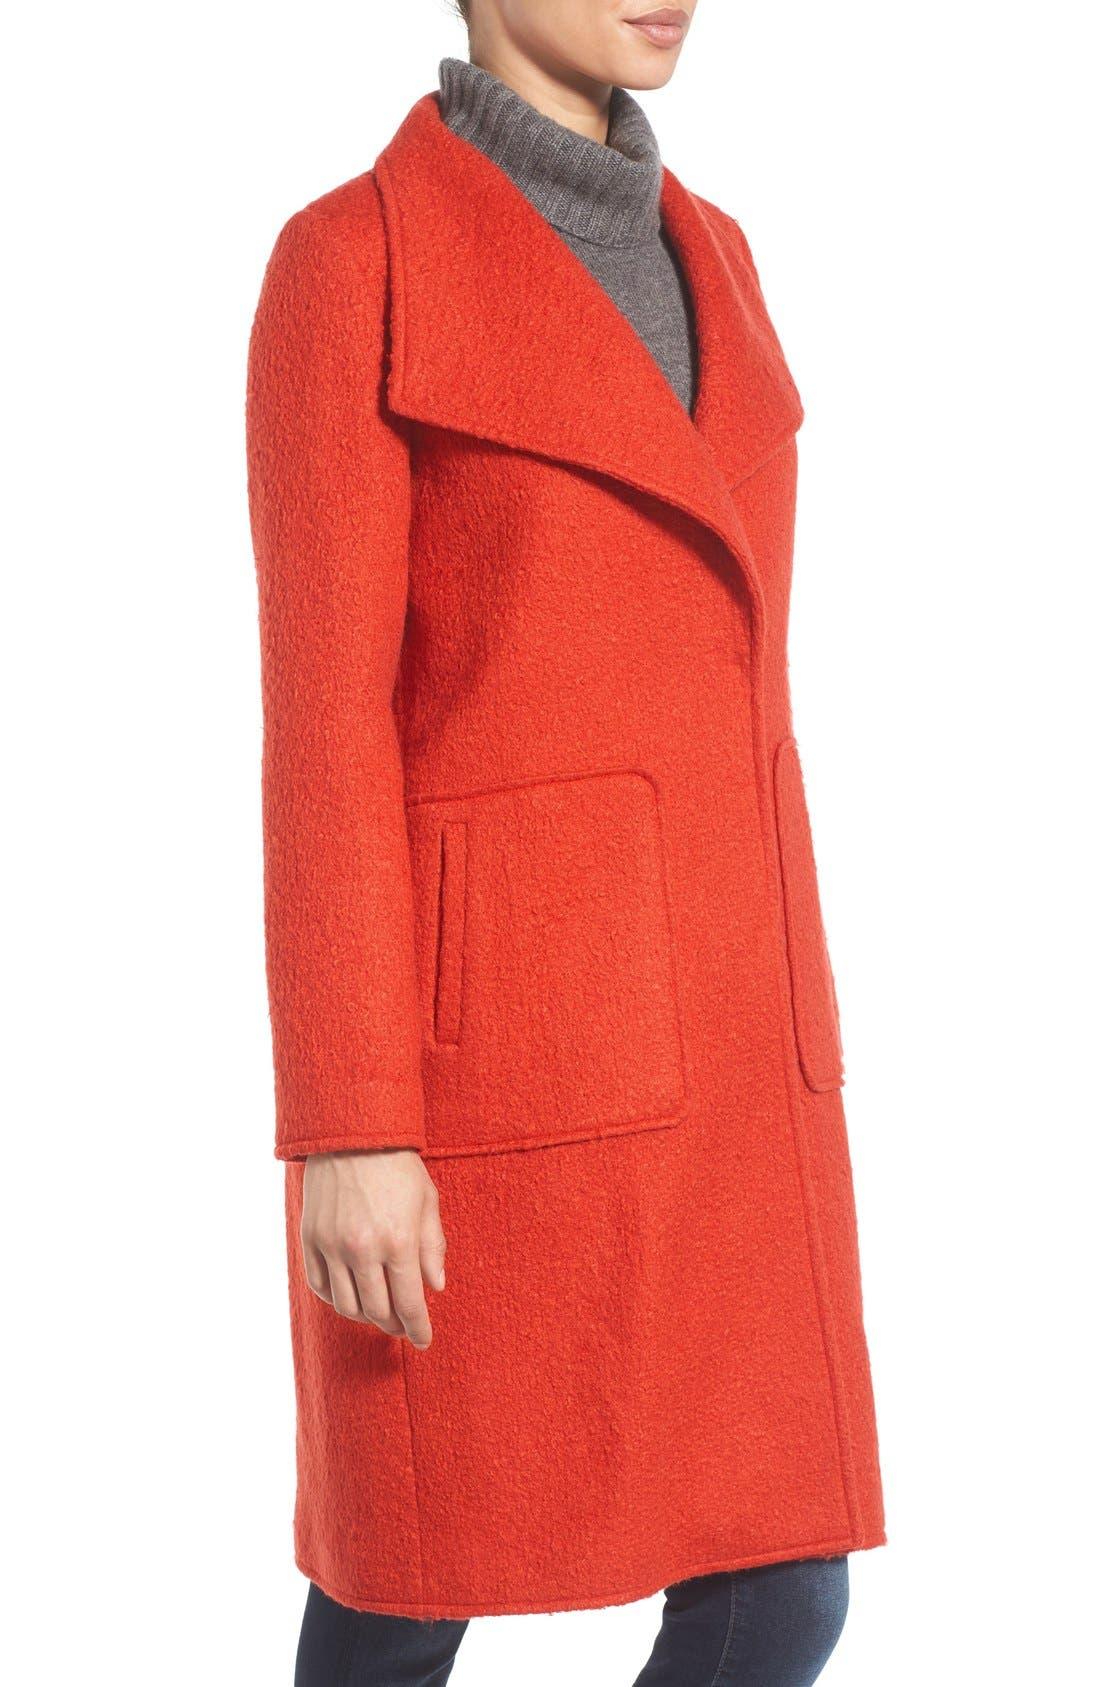 BERNARDO, Textured Long Coat, Alternate thumbnail 3, color, 852